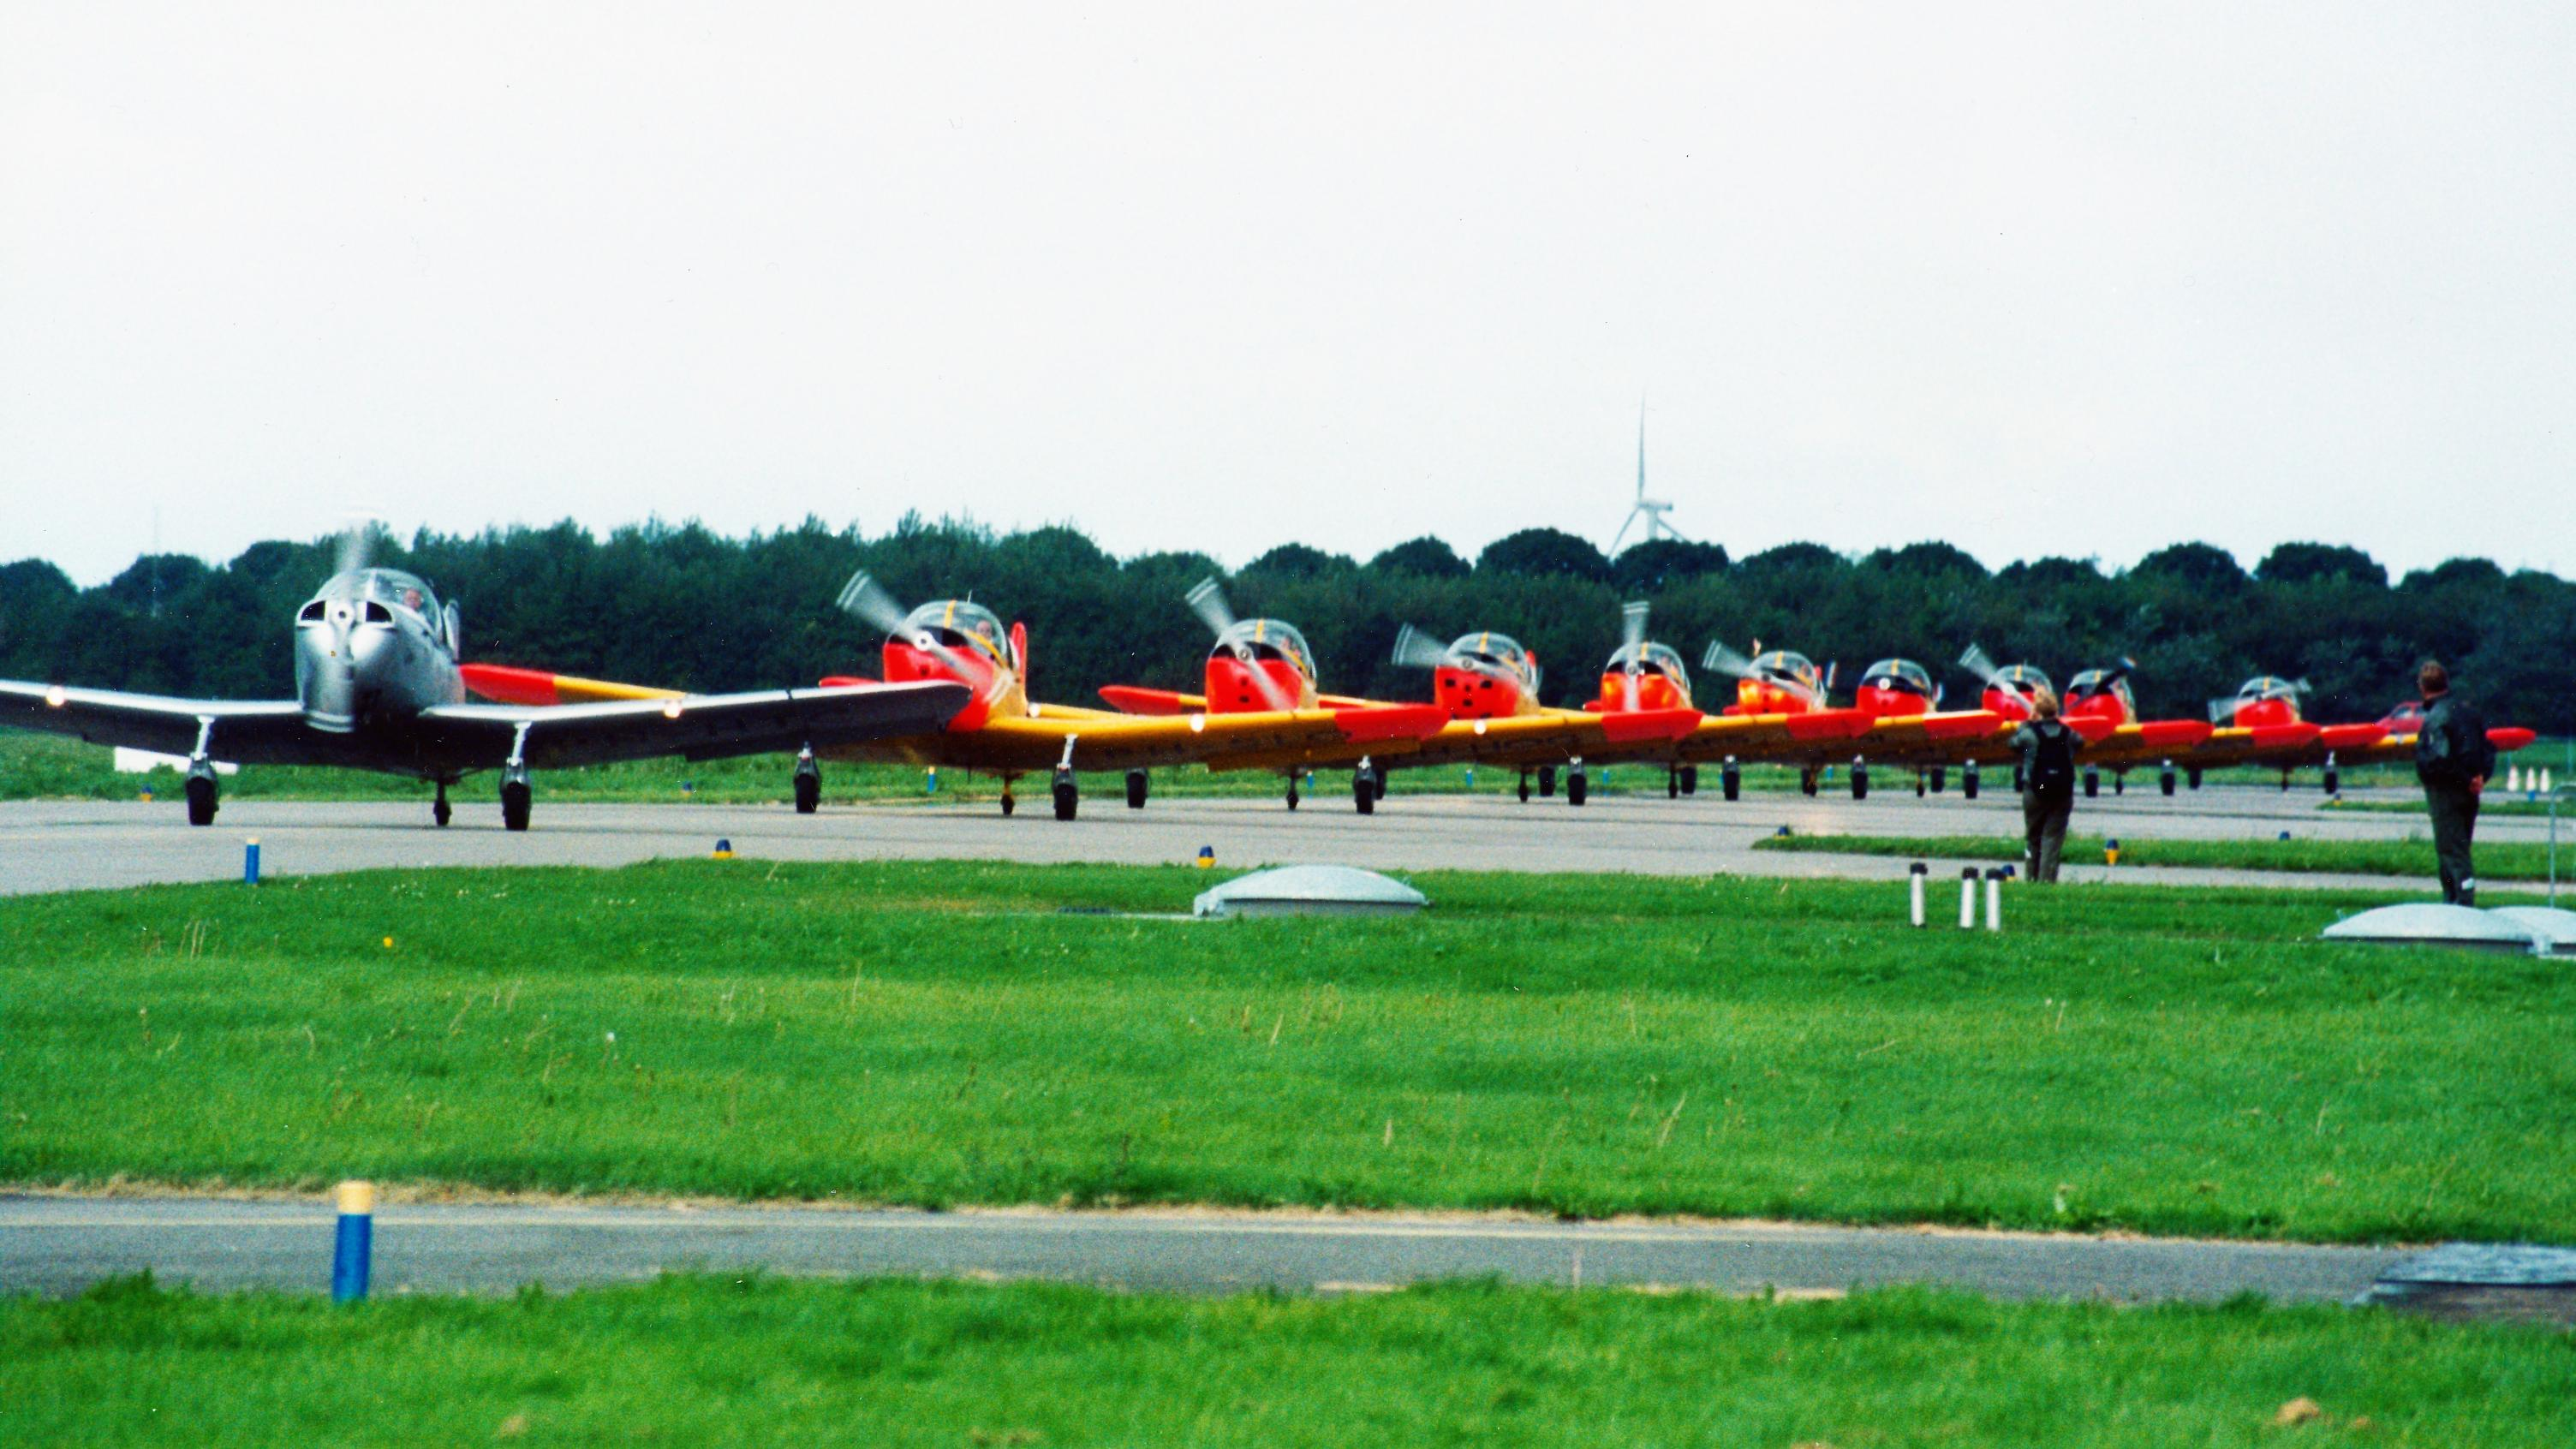 Naam: Fokker S.11 10x 1991 Lelystad.jpg Bekeken: 235 Grootte: 508,3 KB